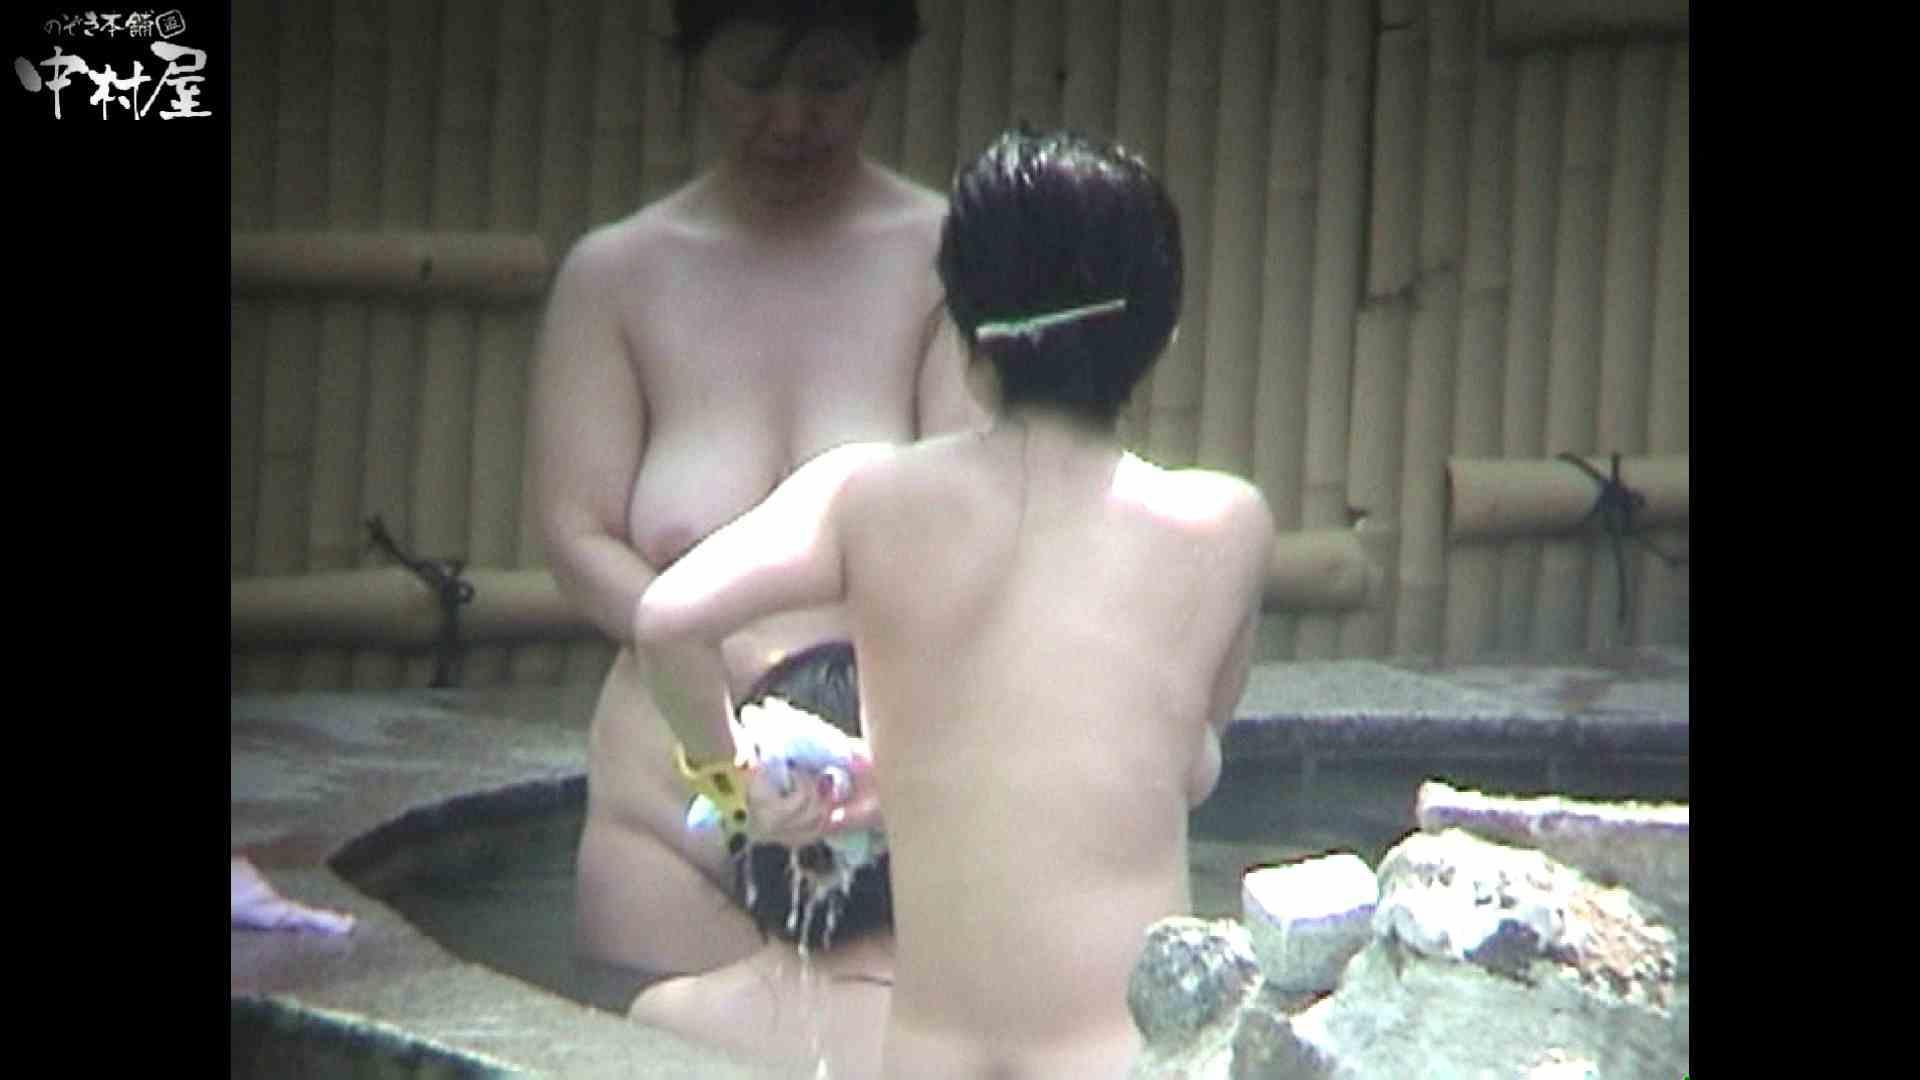 Aquaな露天風呂Vol.936 盗撮映像  110Pix 100